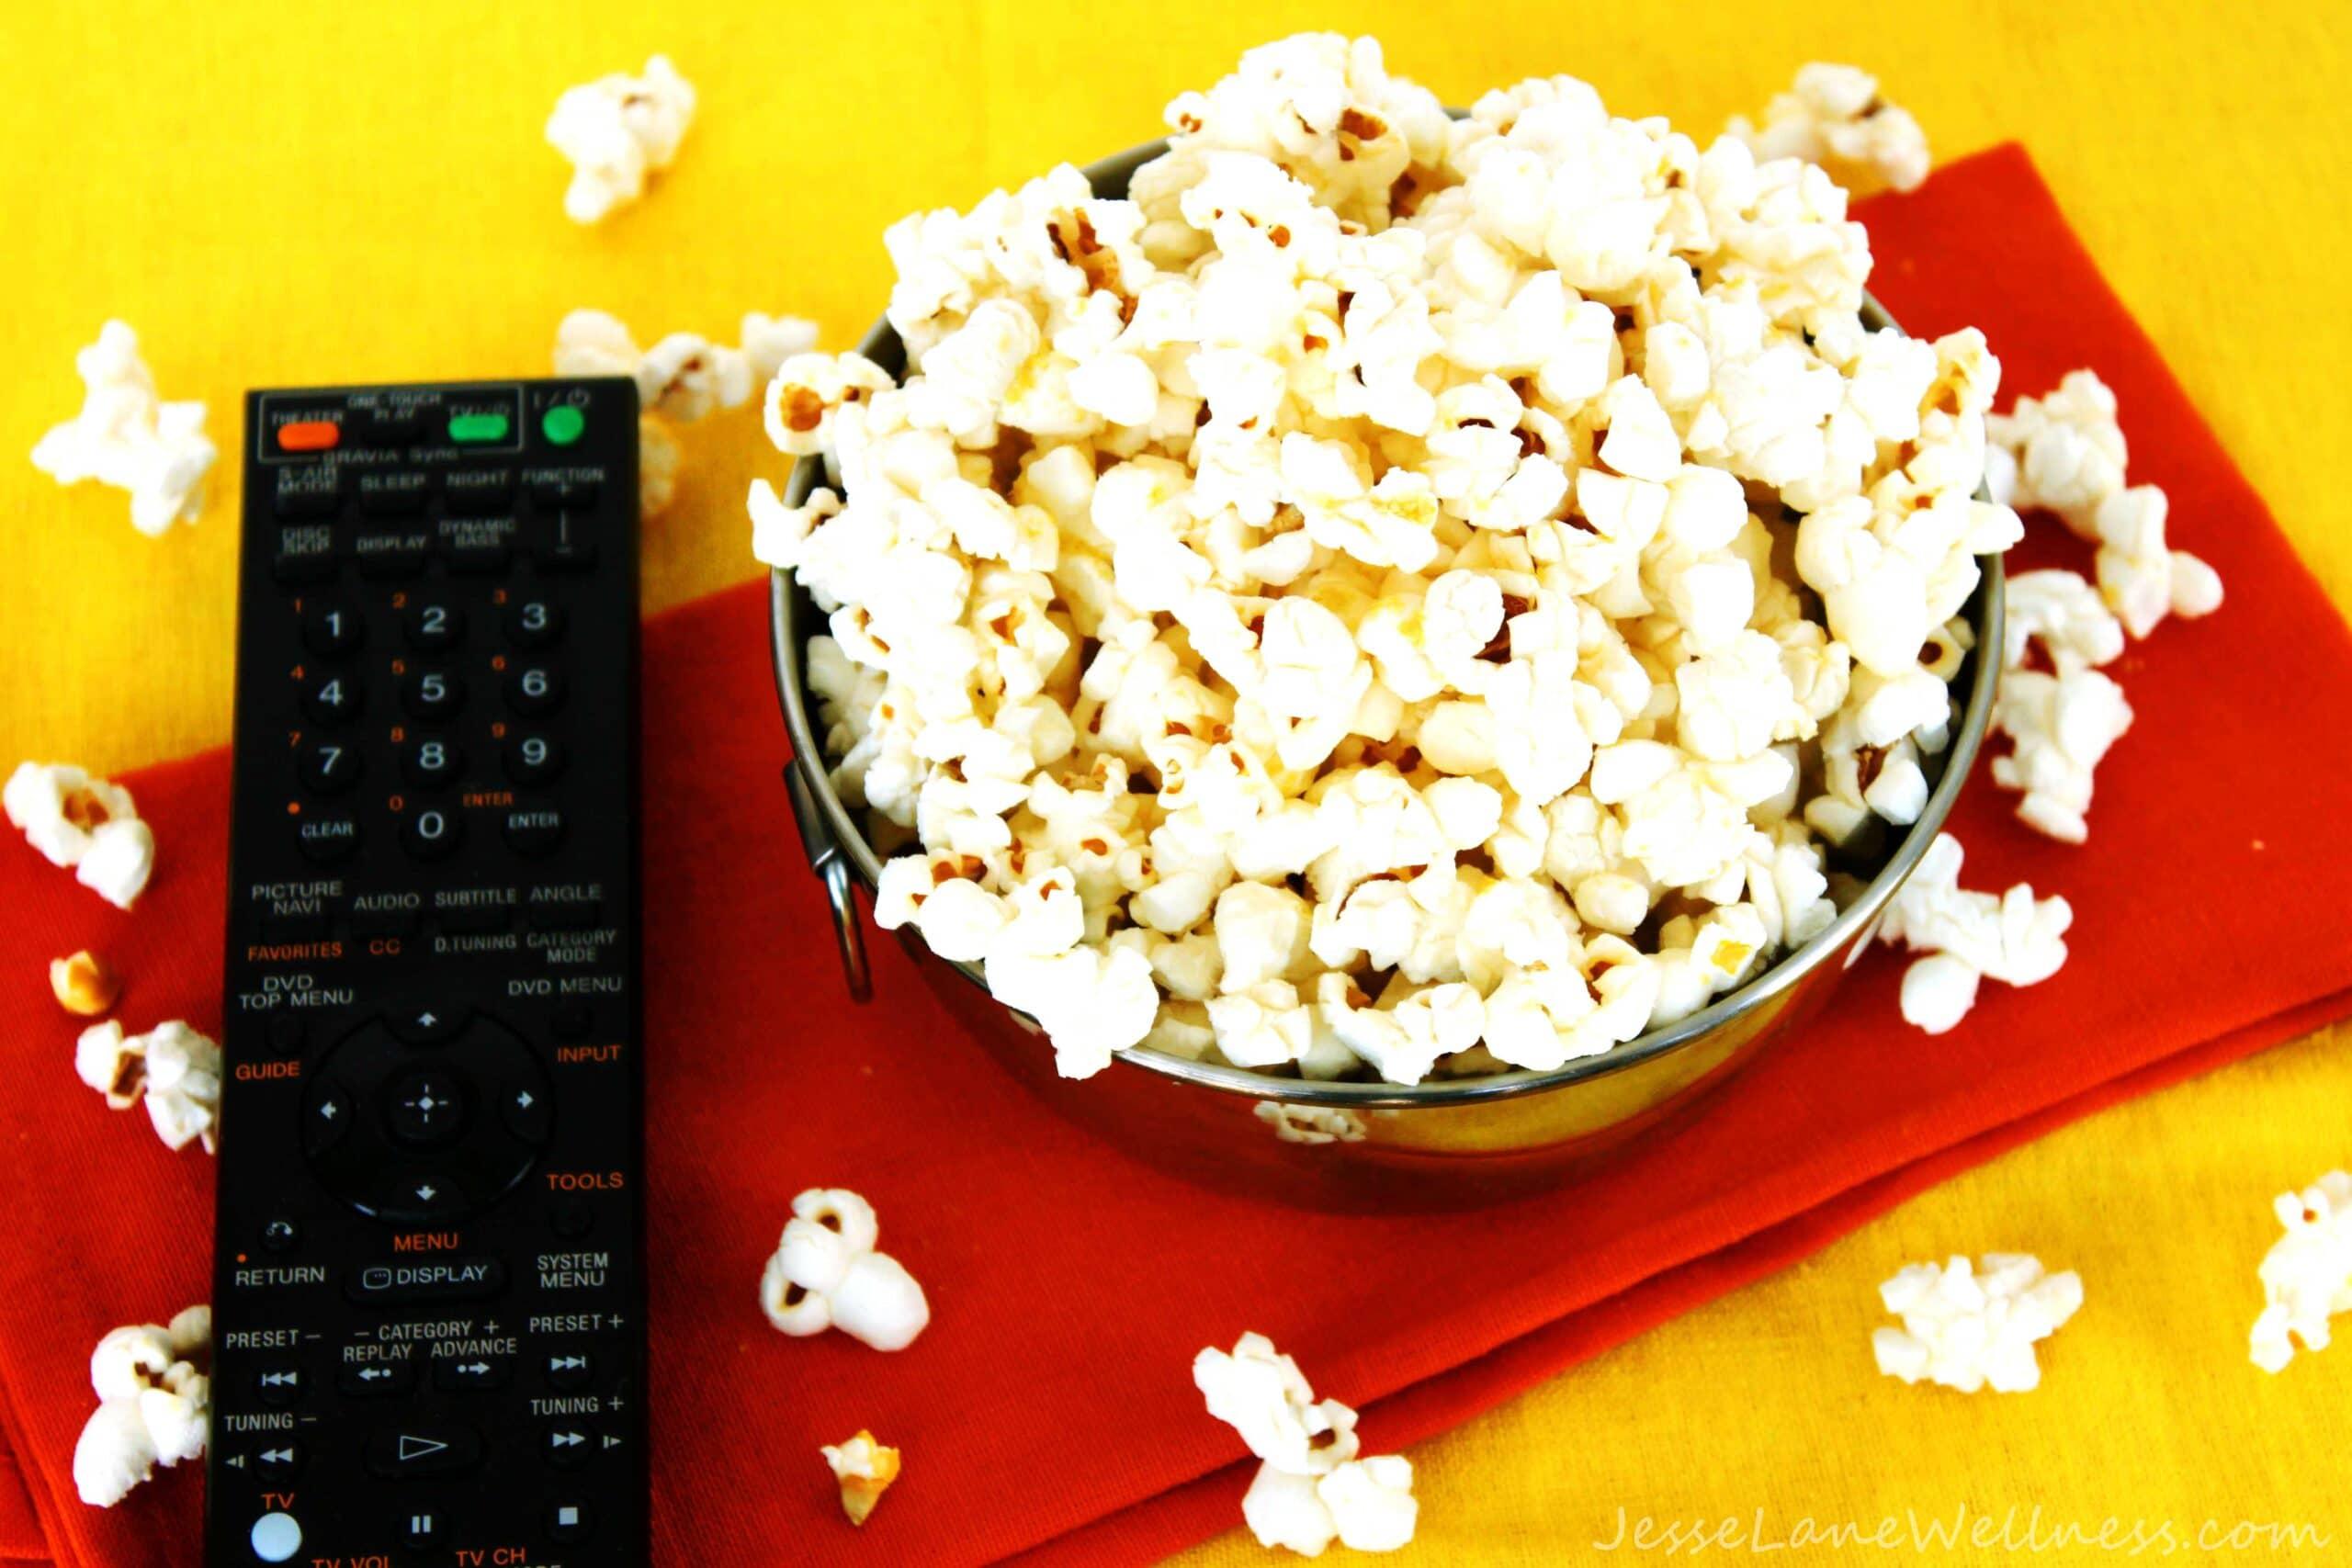 Cheesy Popcorn by @JesseLWellness #popcorn #moviepopcorn